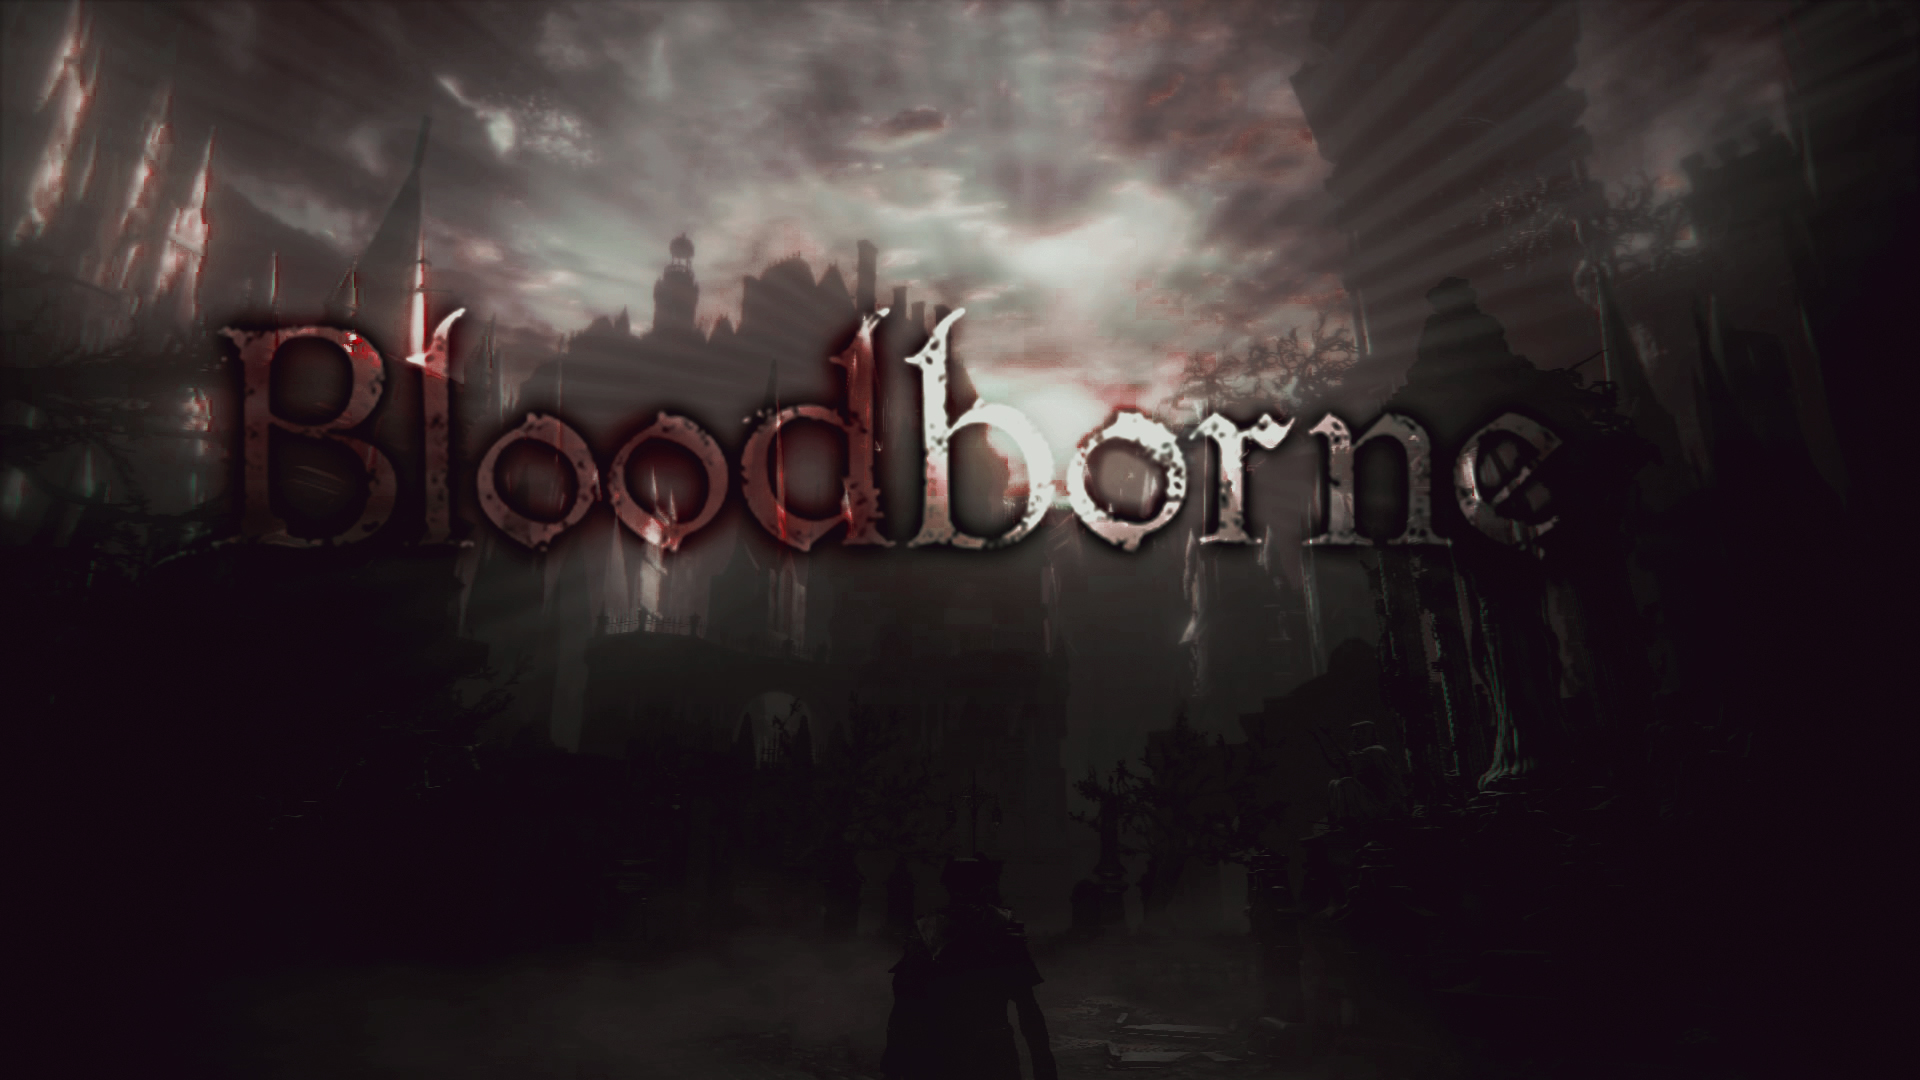 Bloodborne Wallpaper Full HD By Makig On DeviantArt